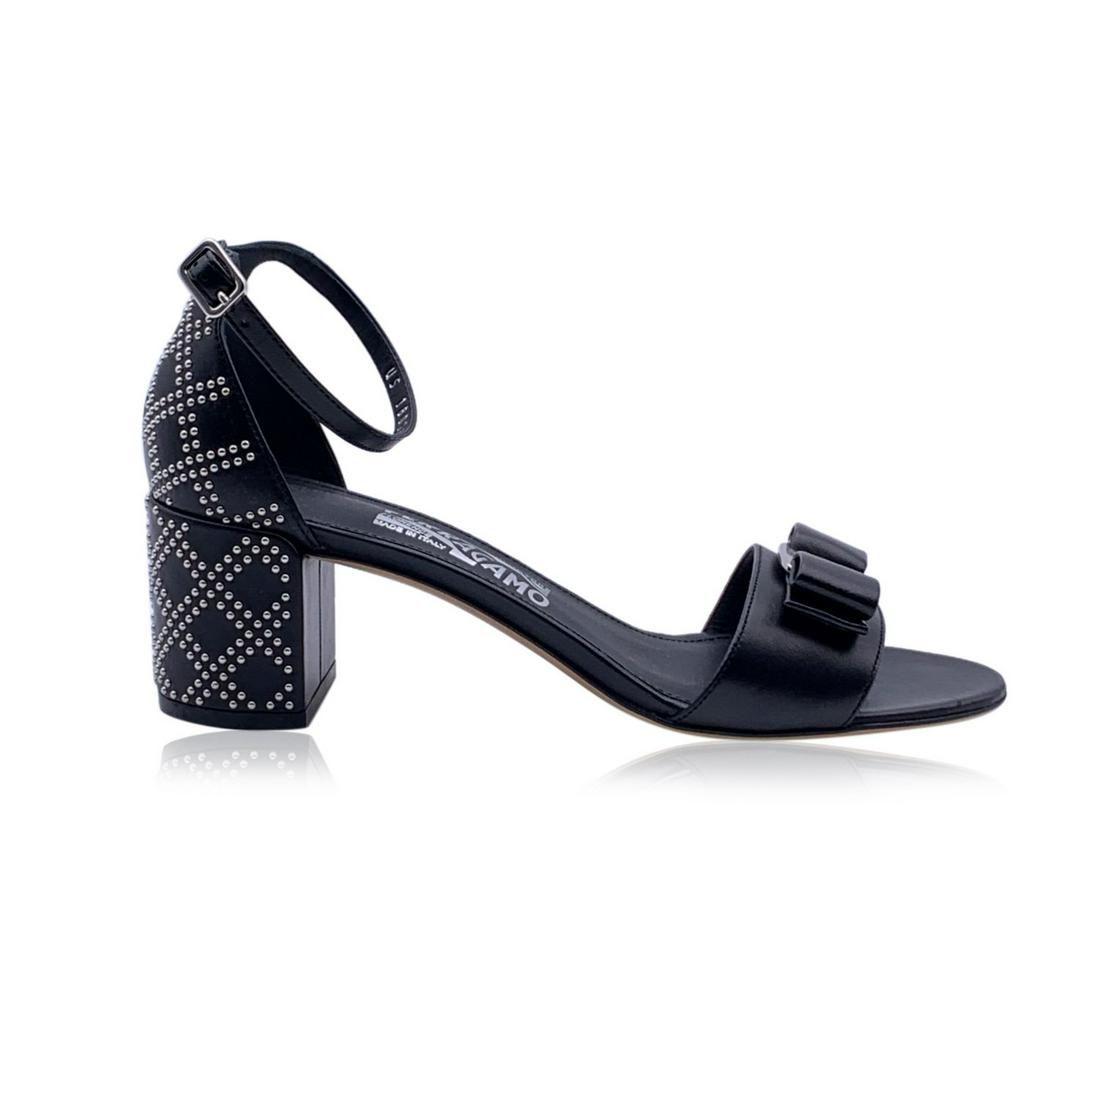 Salvatore Ferragamo Leather Gavina Qs Heeled Sandals US